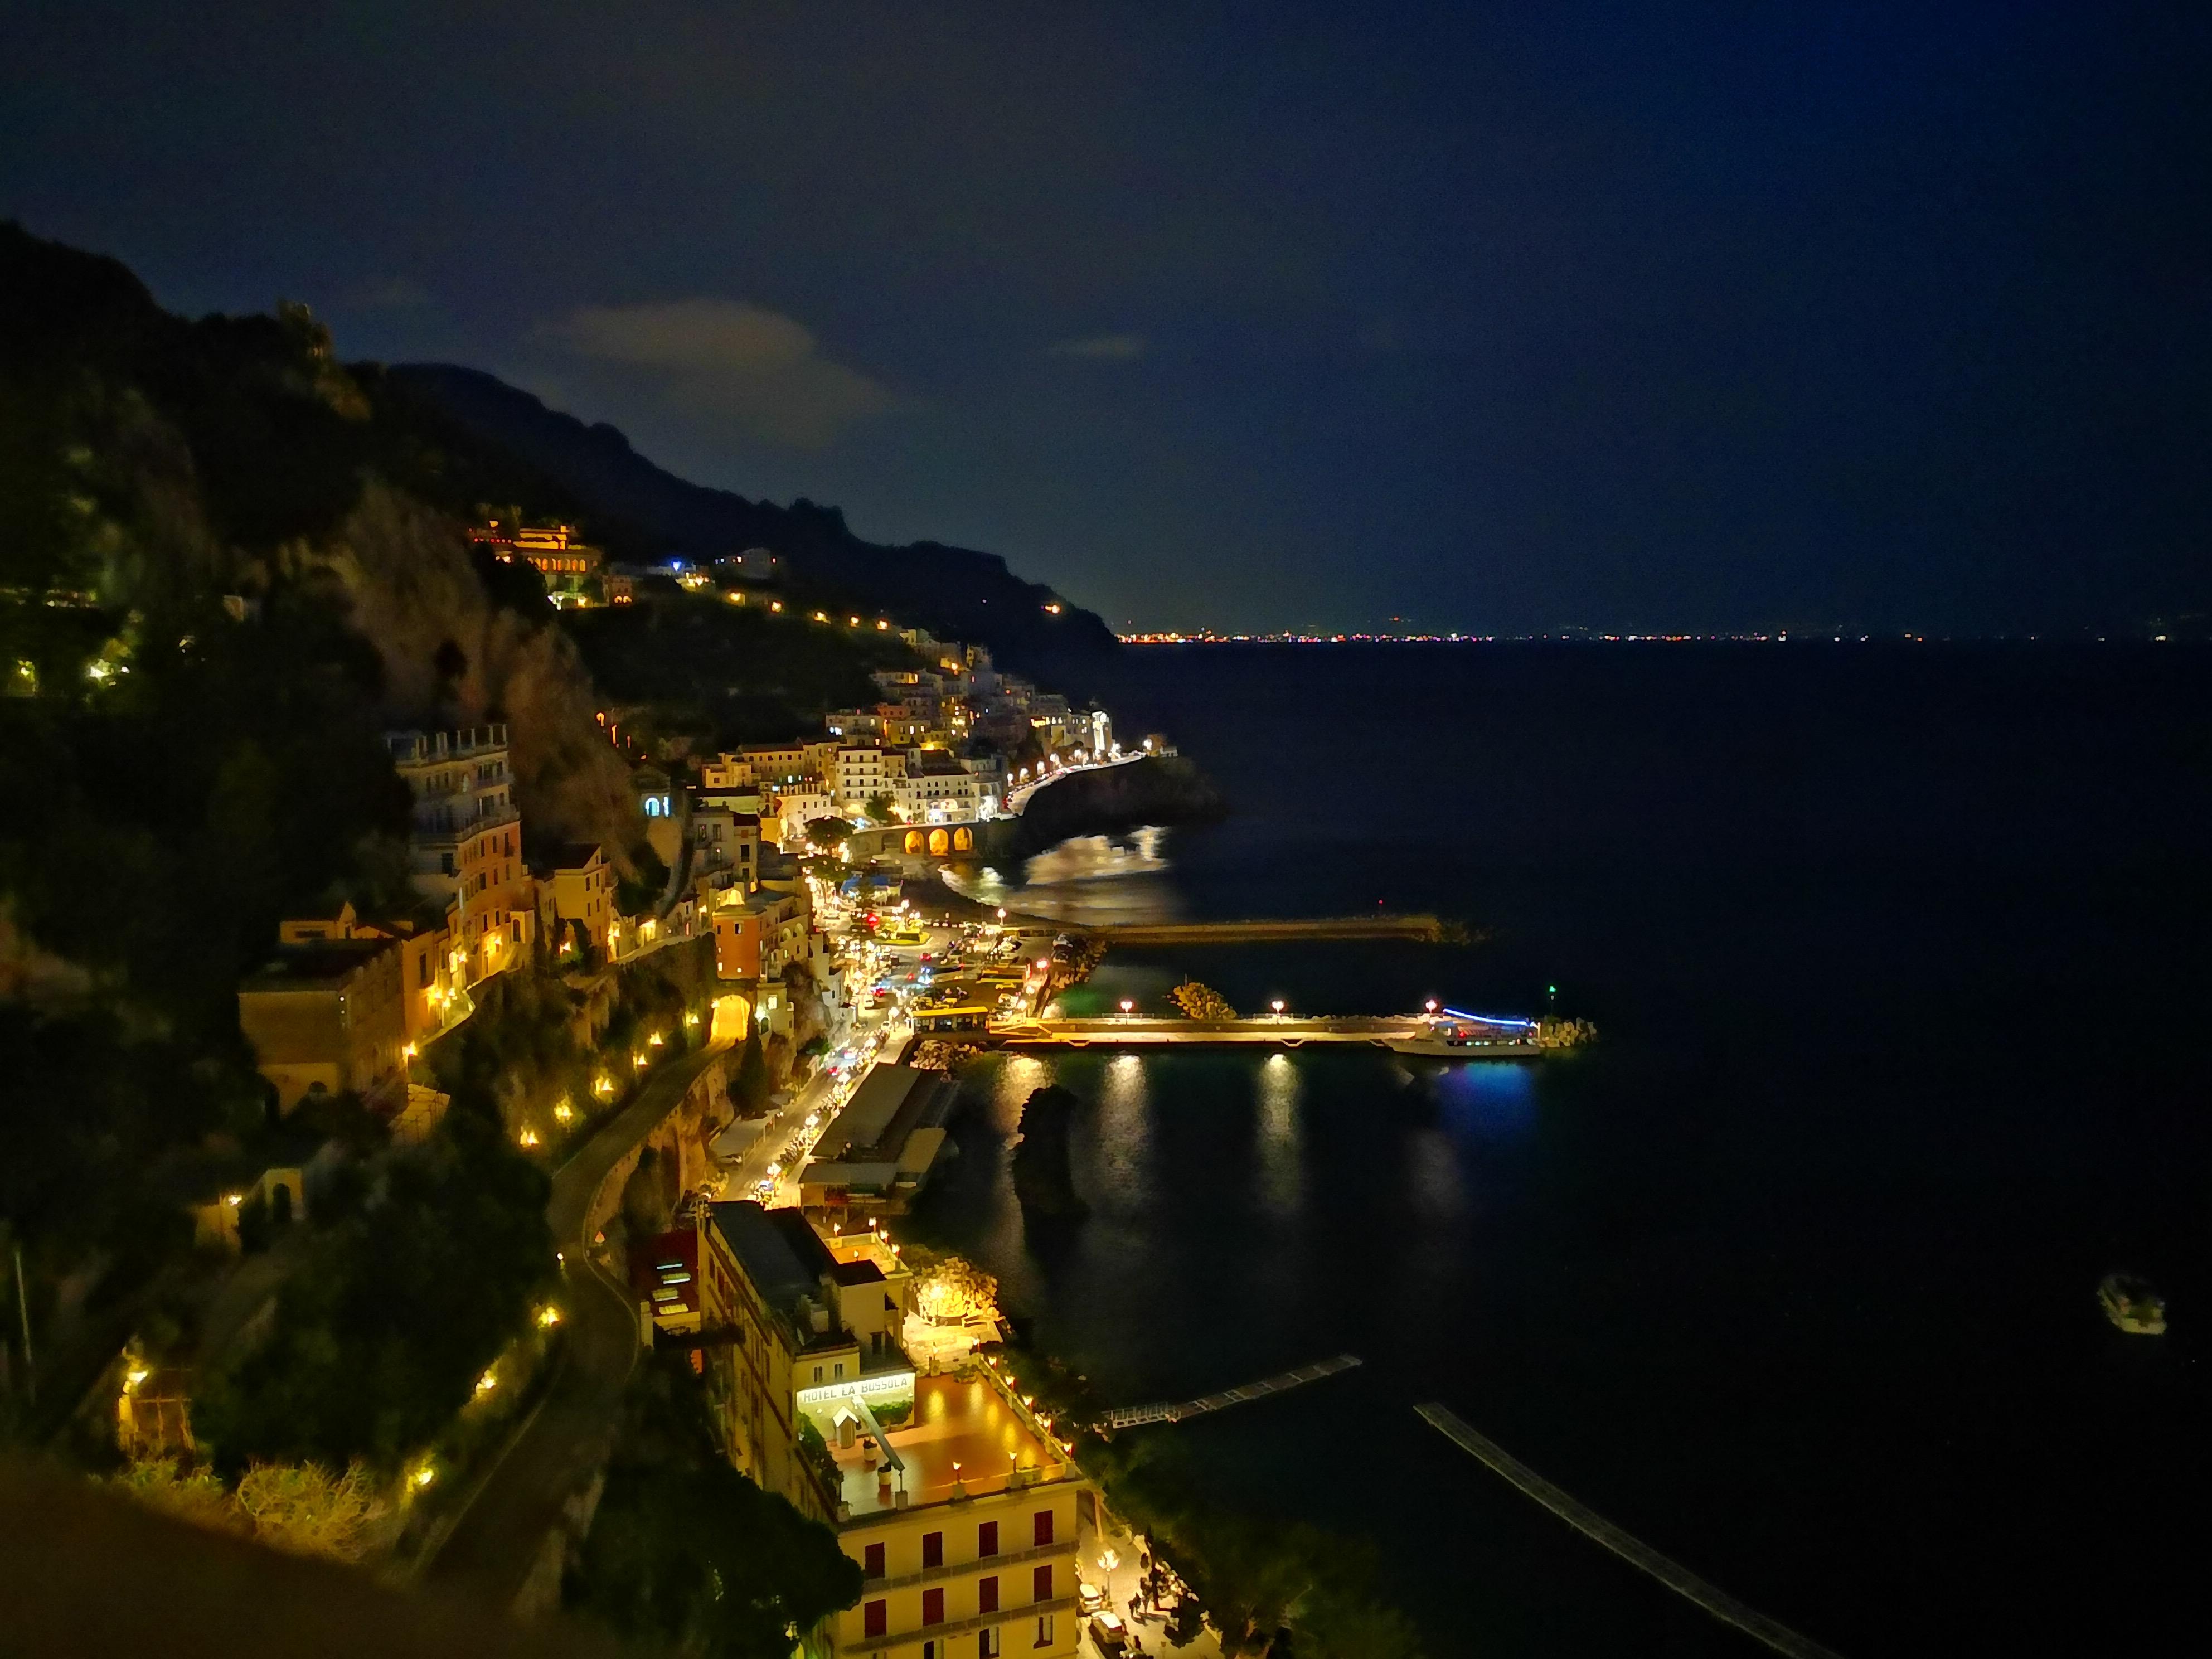 Le tarantelle della vita - Storie d'Amalfi e d'amalfitani